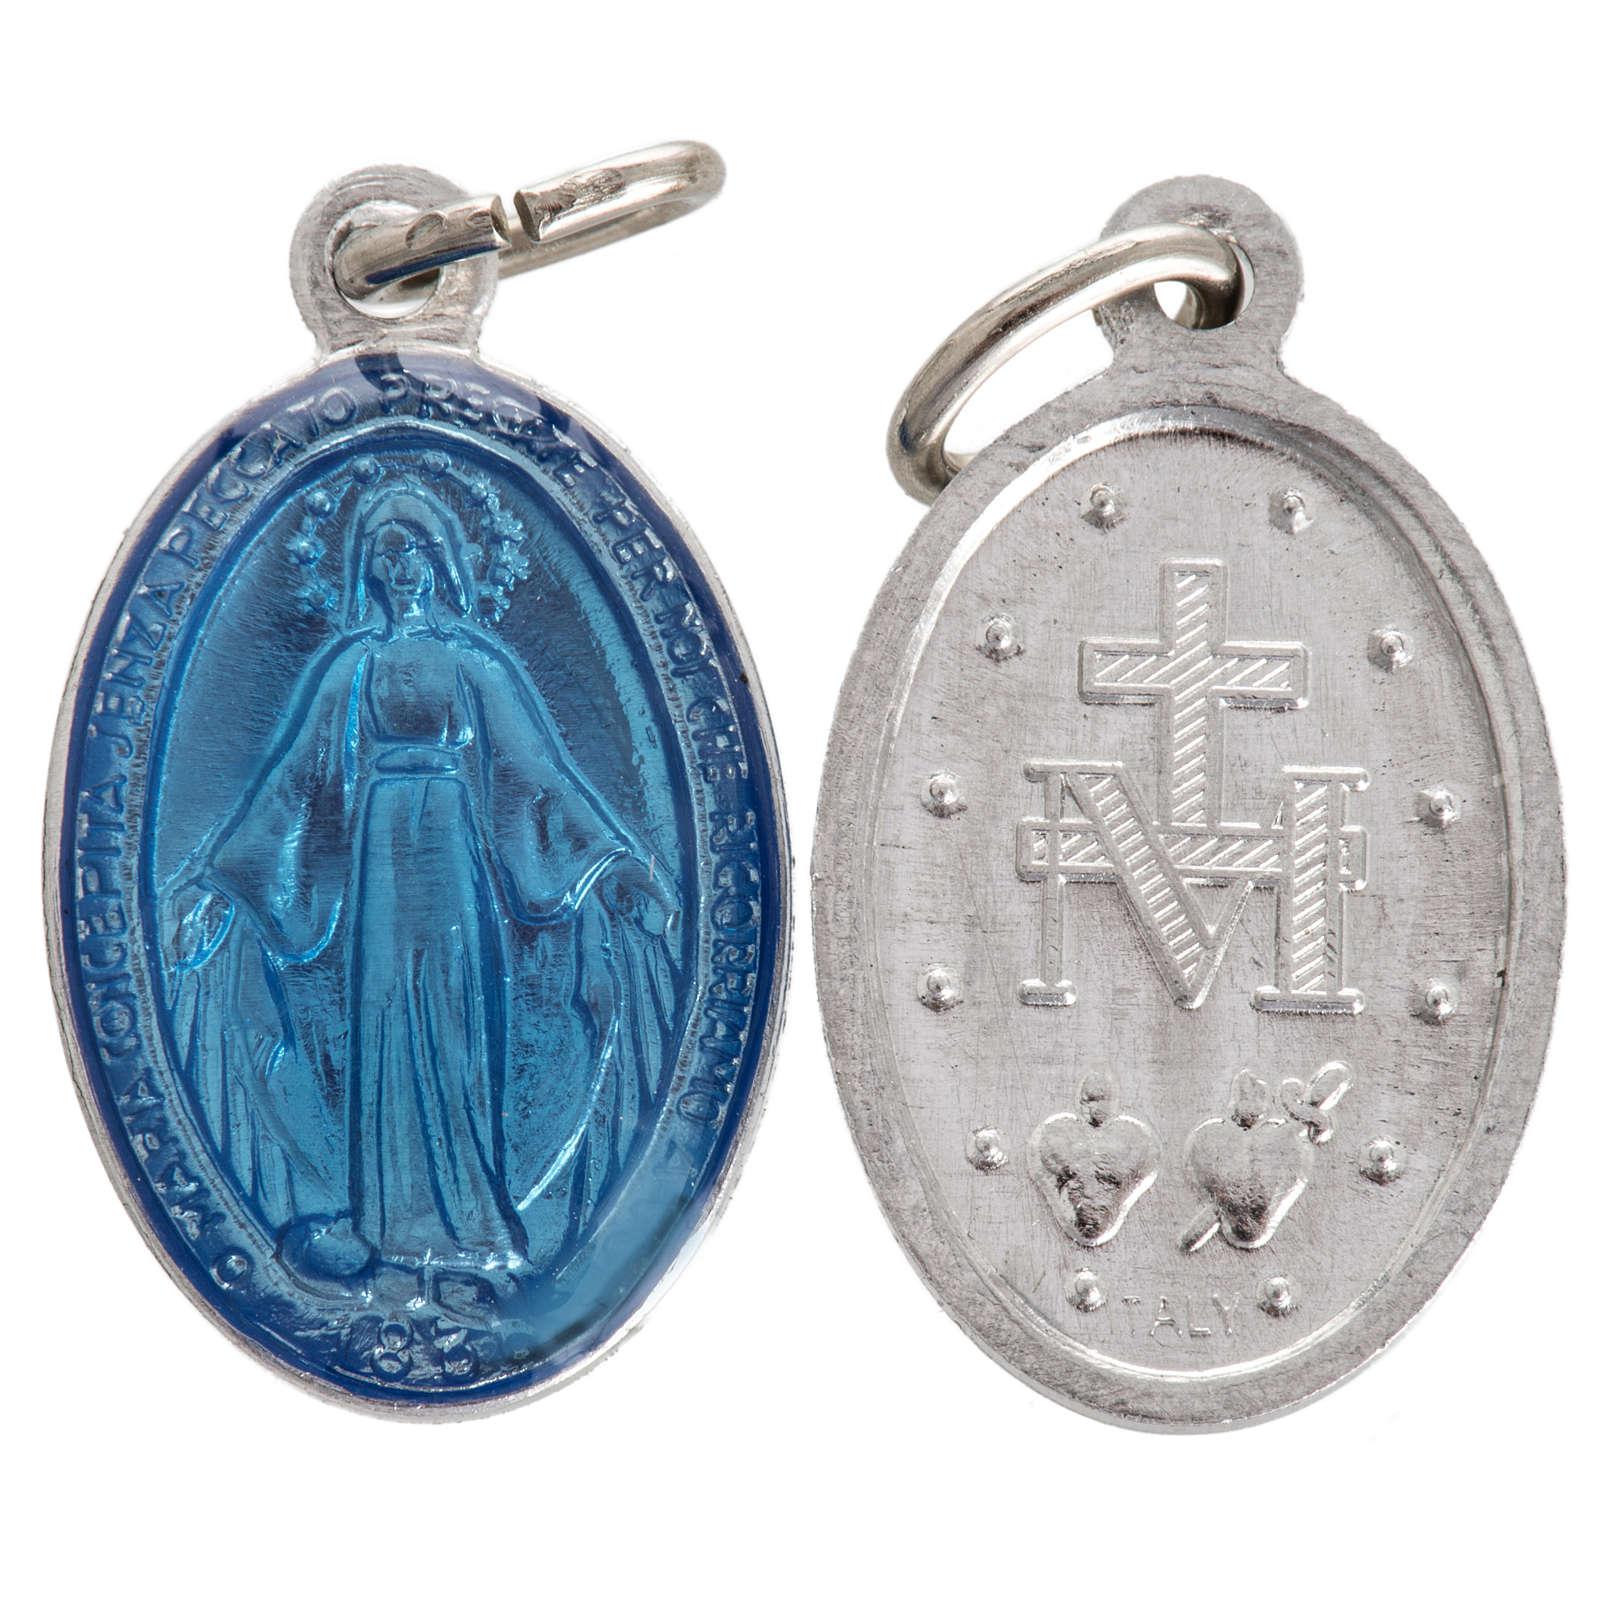 Miraculous Medal in steel and light blue enamel 18mm 4